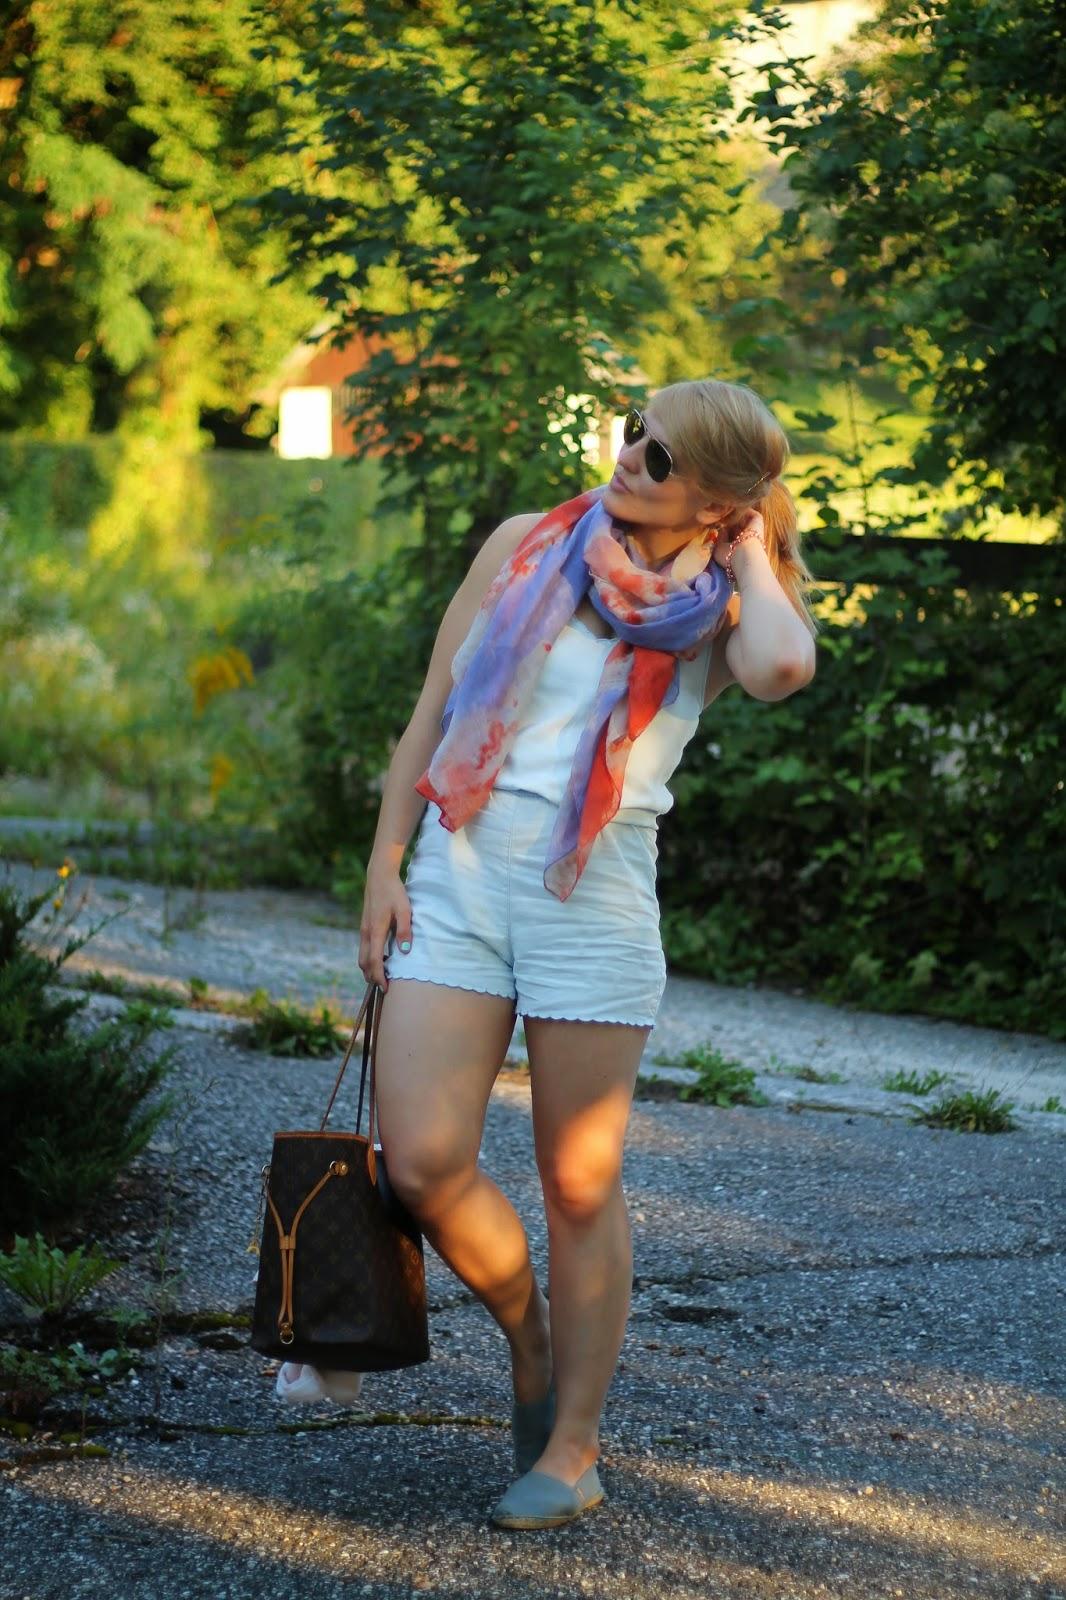 xFashionblogger Austria / Österreich / Deutsch / German / Kärnten / Carinthia / Klagenfurt / Köttmannsdorf / Spring Look / Classy / Edgy / Summer / Summer Style 2014 / Summer Look / Fashionista Look /   / Summer Look / Hot to style Jumpsuit Playsuit / Blazer NUde h&M / Scarf Pastel Colors Candy Colors Zara / Espadrillsa Espadrij / H&M / Ray Ban Aviator / Louis Vuitton Neverfull Monogram Canvas MC /